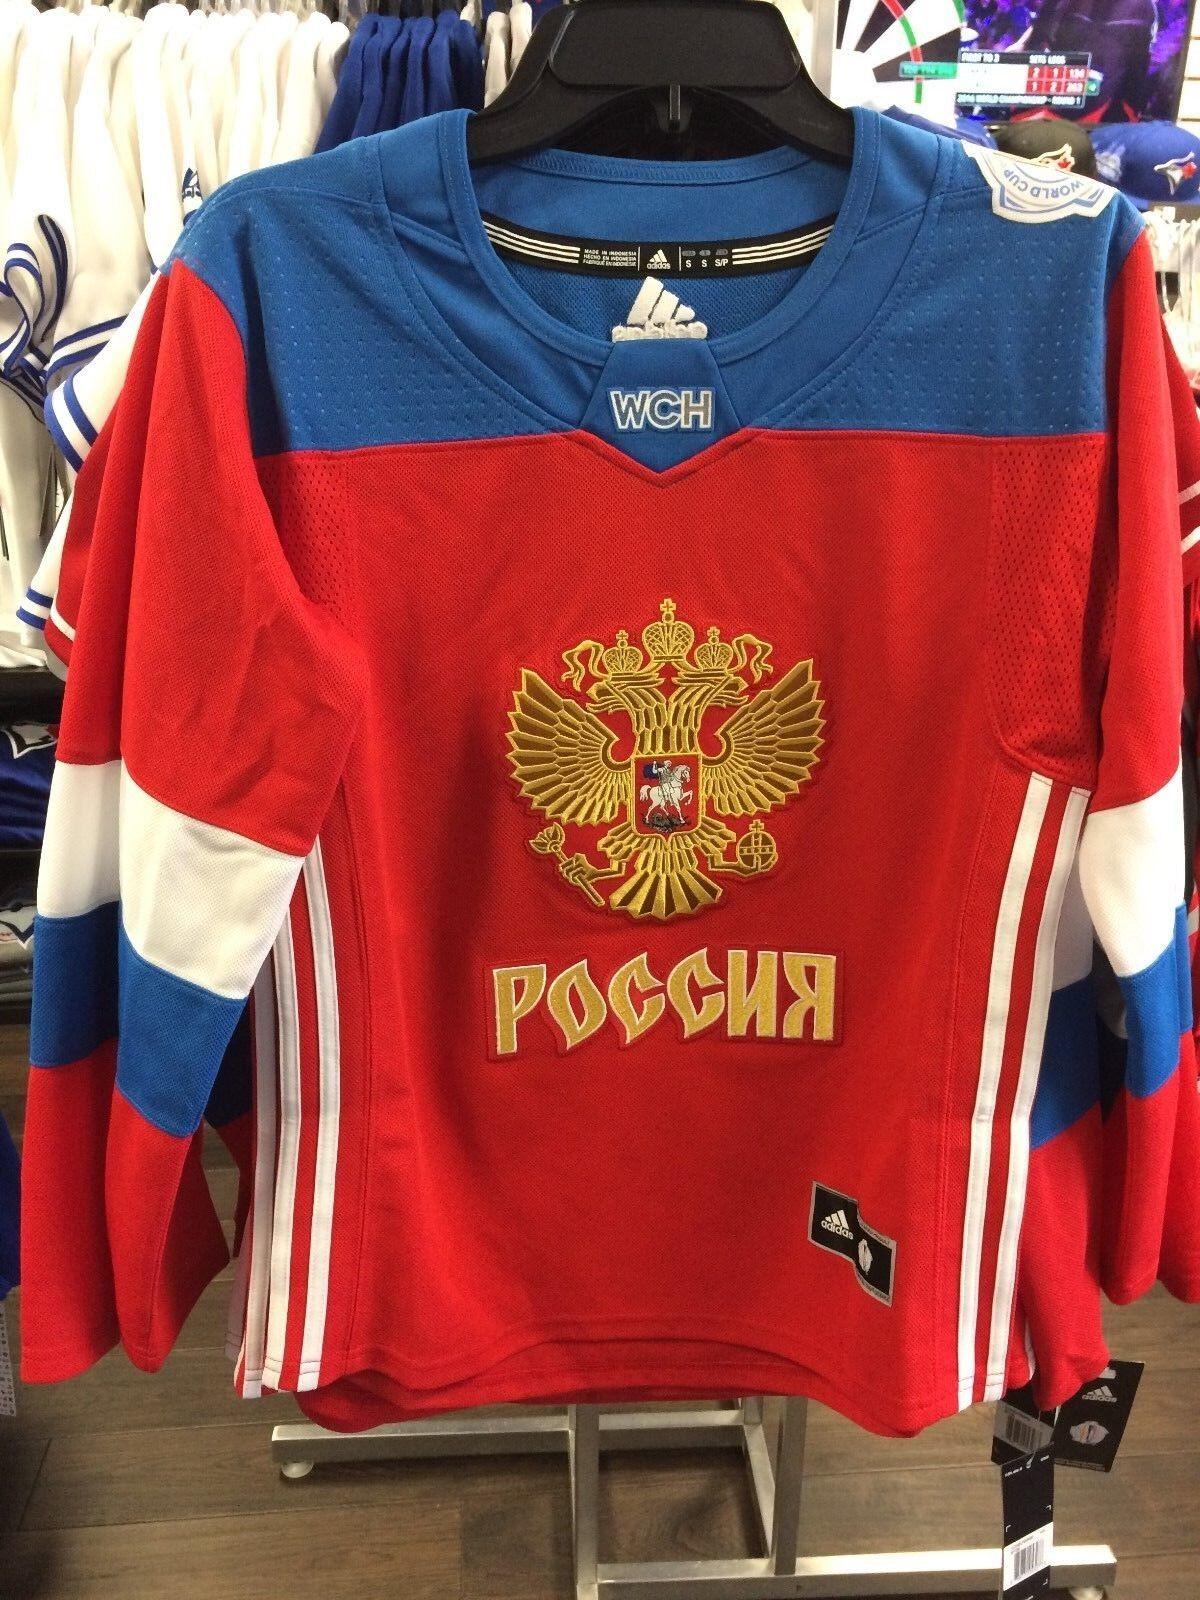 Équipe de la Coupe du Monde de Hockey de Russie de Russie Adidas Jersey Replica Medium Dames Femmes